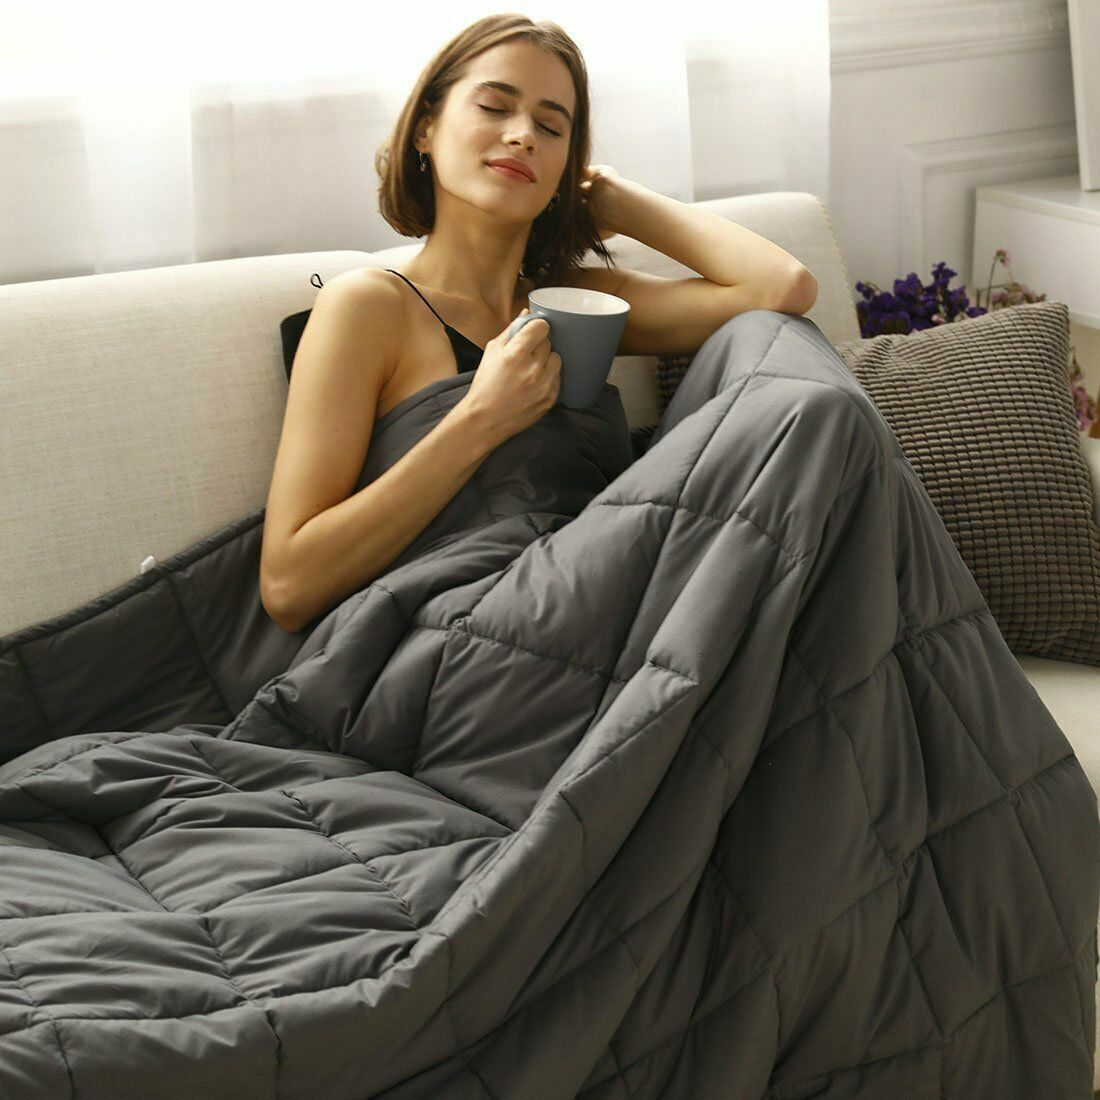 Weighted Blanket -  King Size Mattress Enjoy Quality Sleep